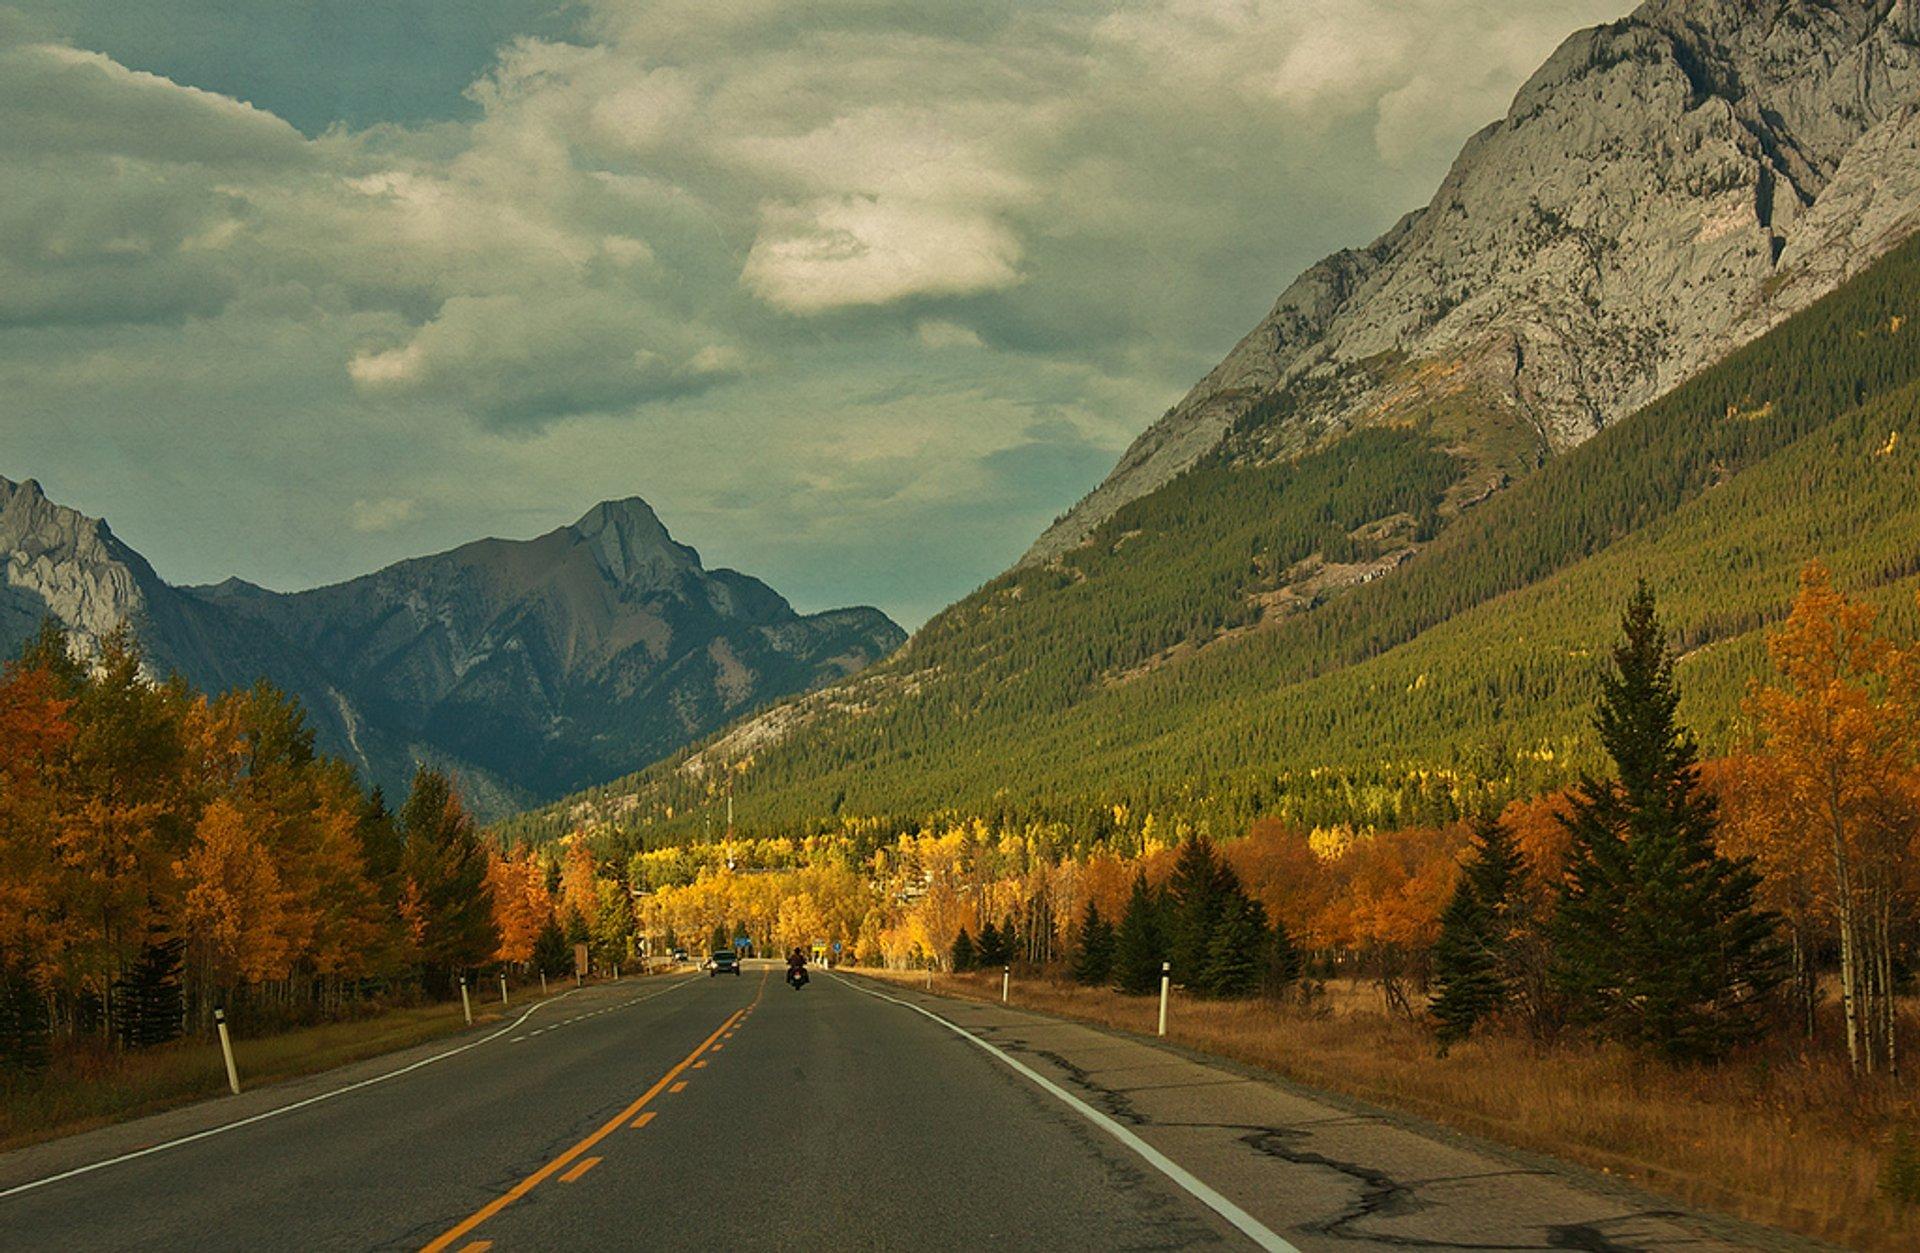 Highway #40 going north, Kananaskis country, Alberta, Canada 2019